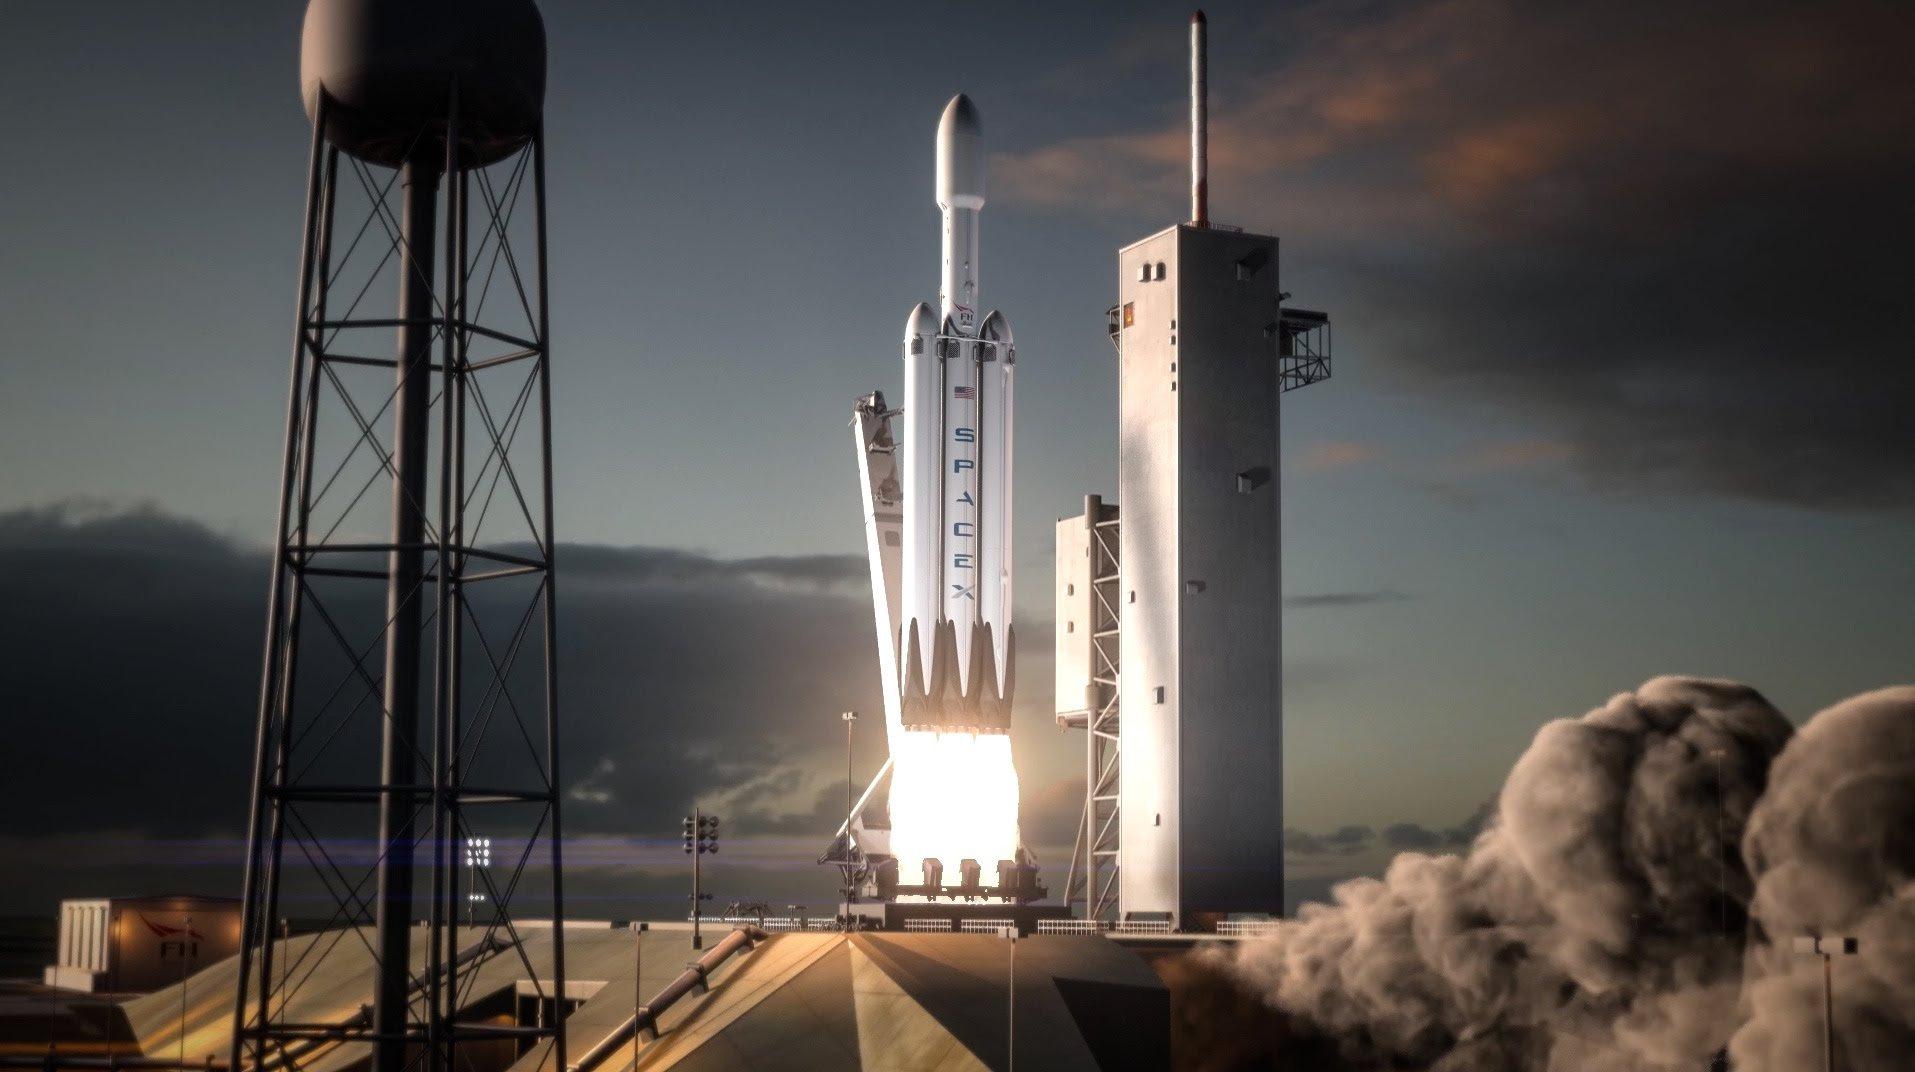 'SpaceX'in Falcon Heavy raketi uçuş startına hazırdır (VİDEO)